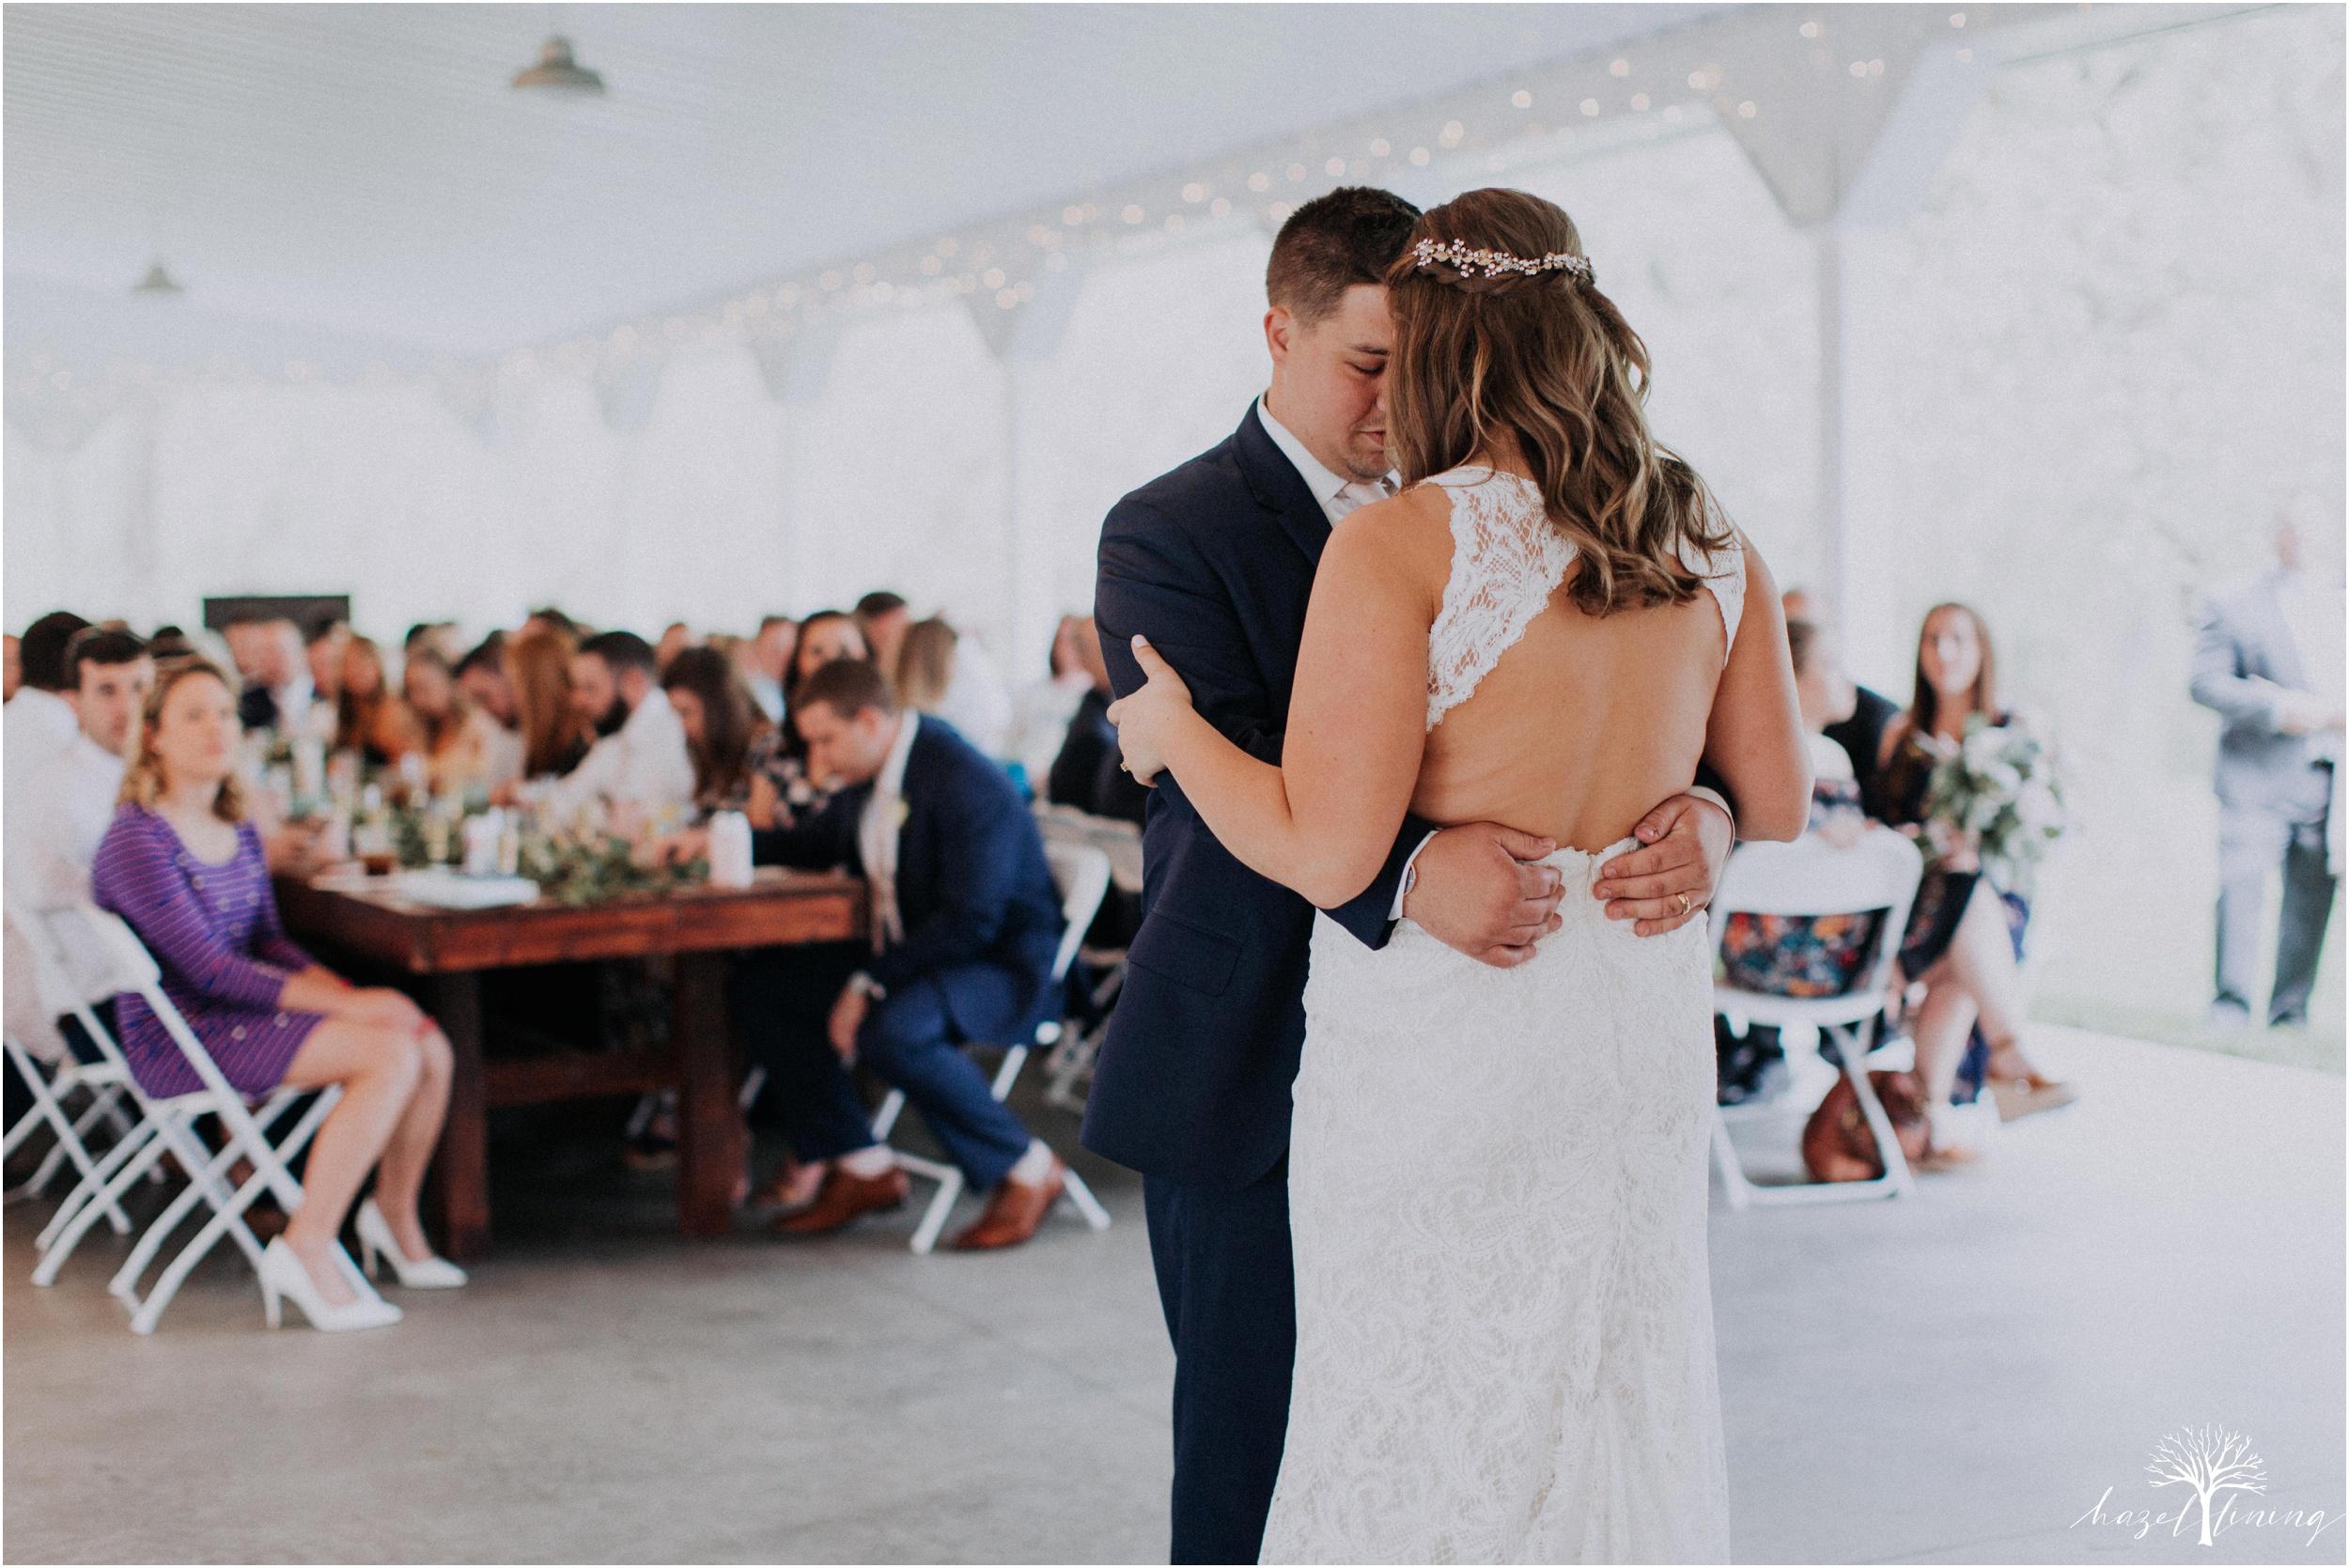 hazel-lining-travel-wedding-elopement-photography-abby-skyler-hunt-the-willis-house-york-pennsylvania-outdoor-estate-wedding_0109.jpg